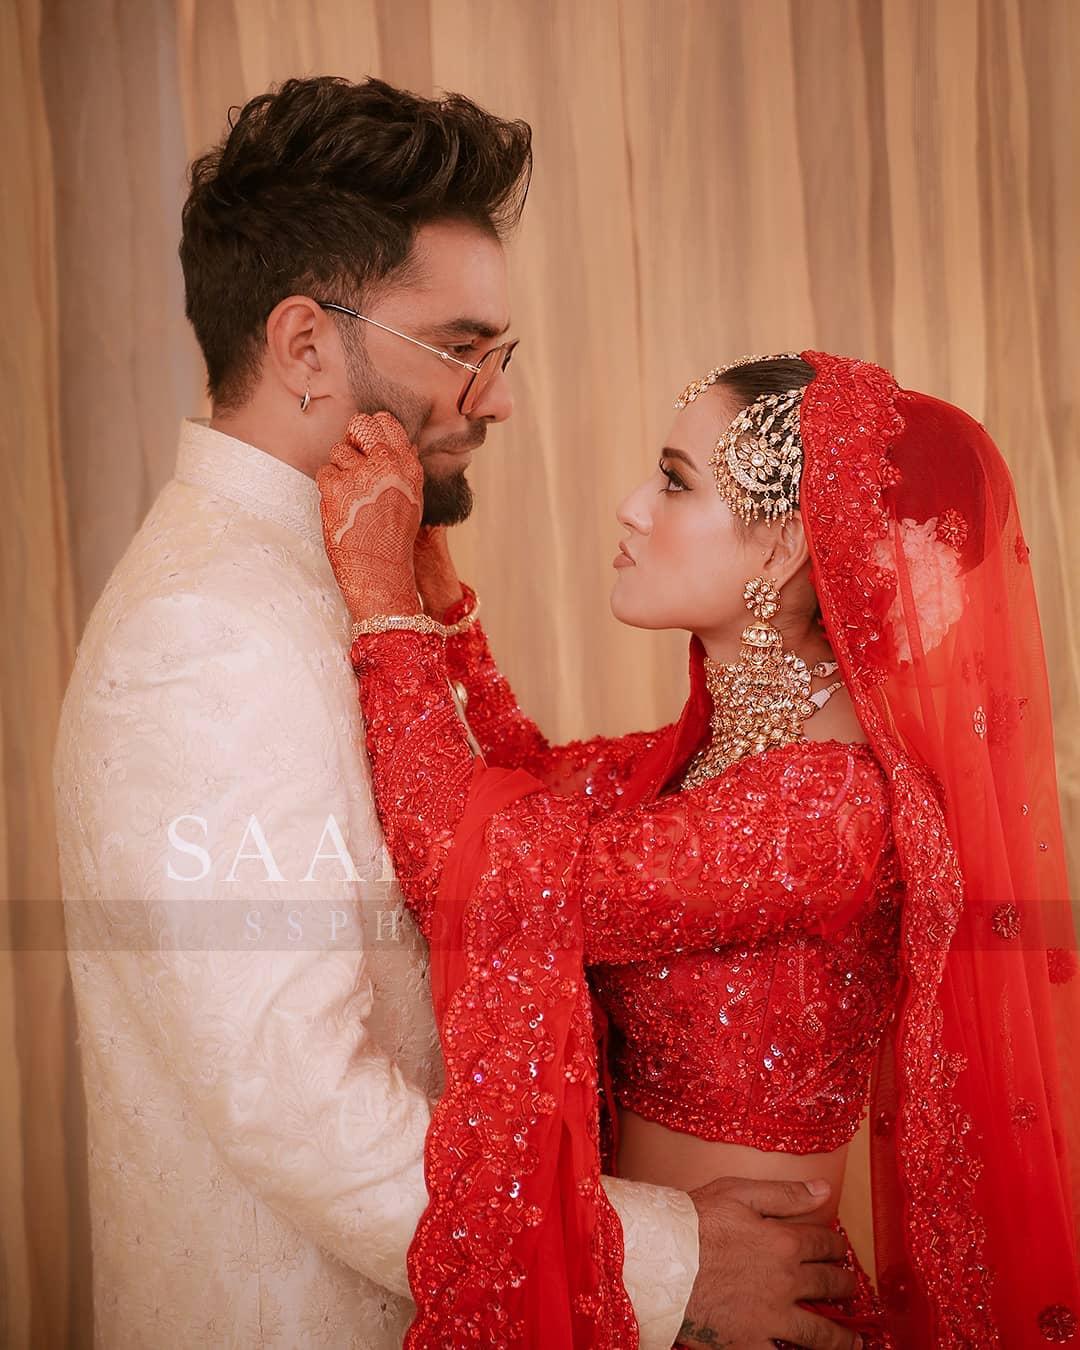 Iqra Aziz and Yasir Hussain Wedding Pictures (28)